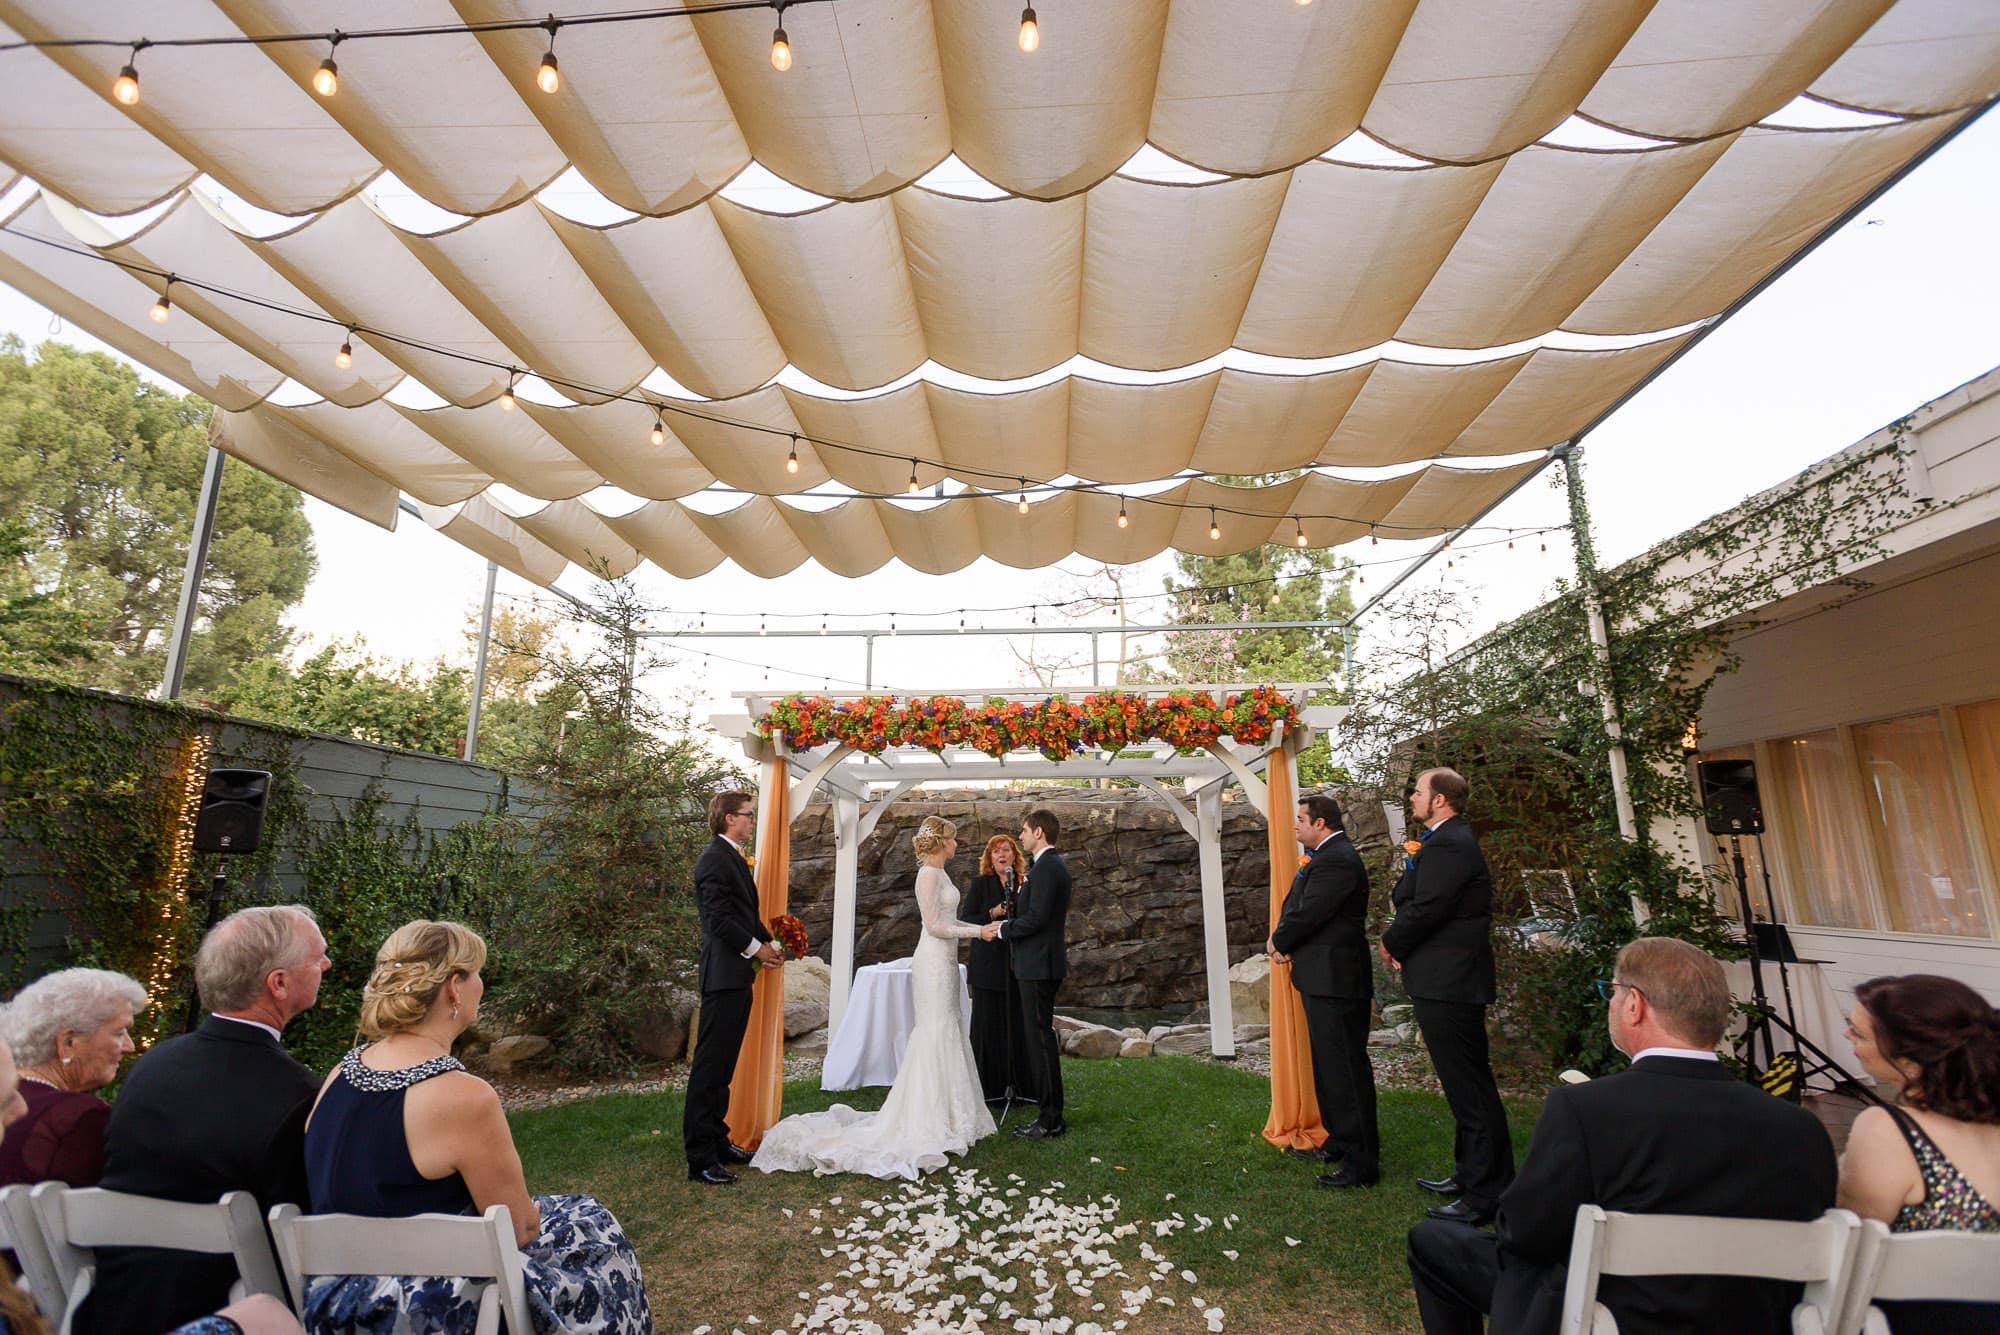 054_Alan_and_Heidi_Los_Angeles_Equestrian_Center_Wedding